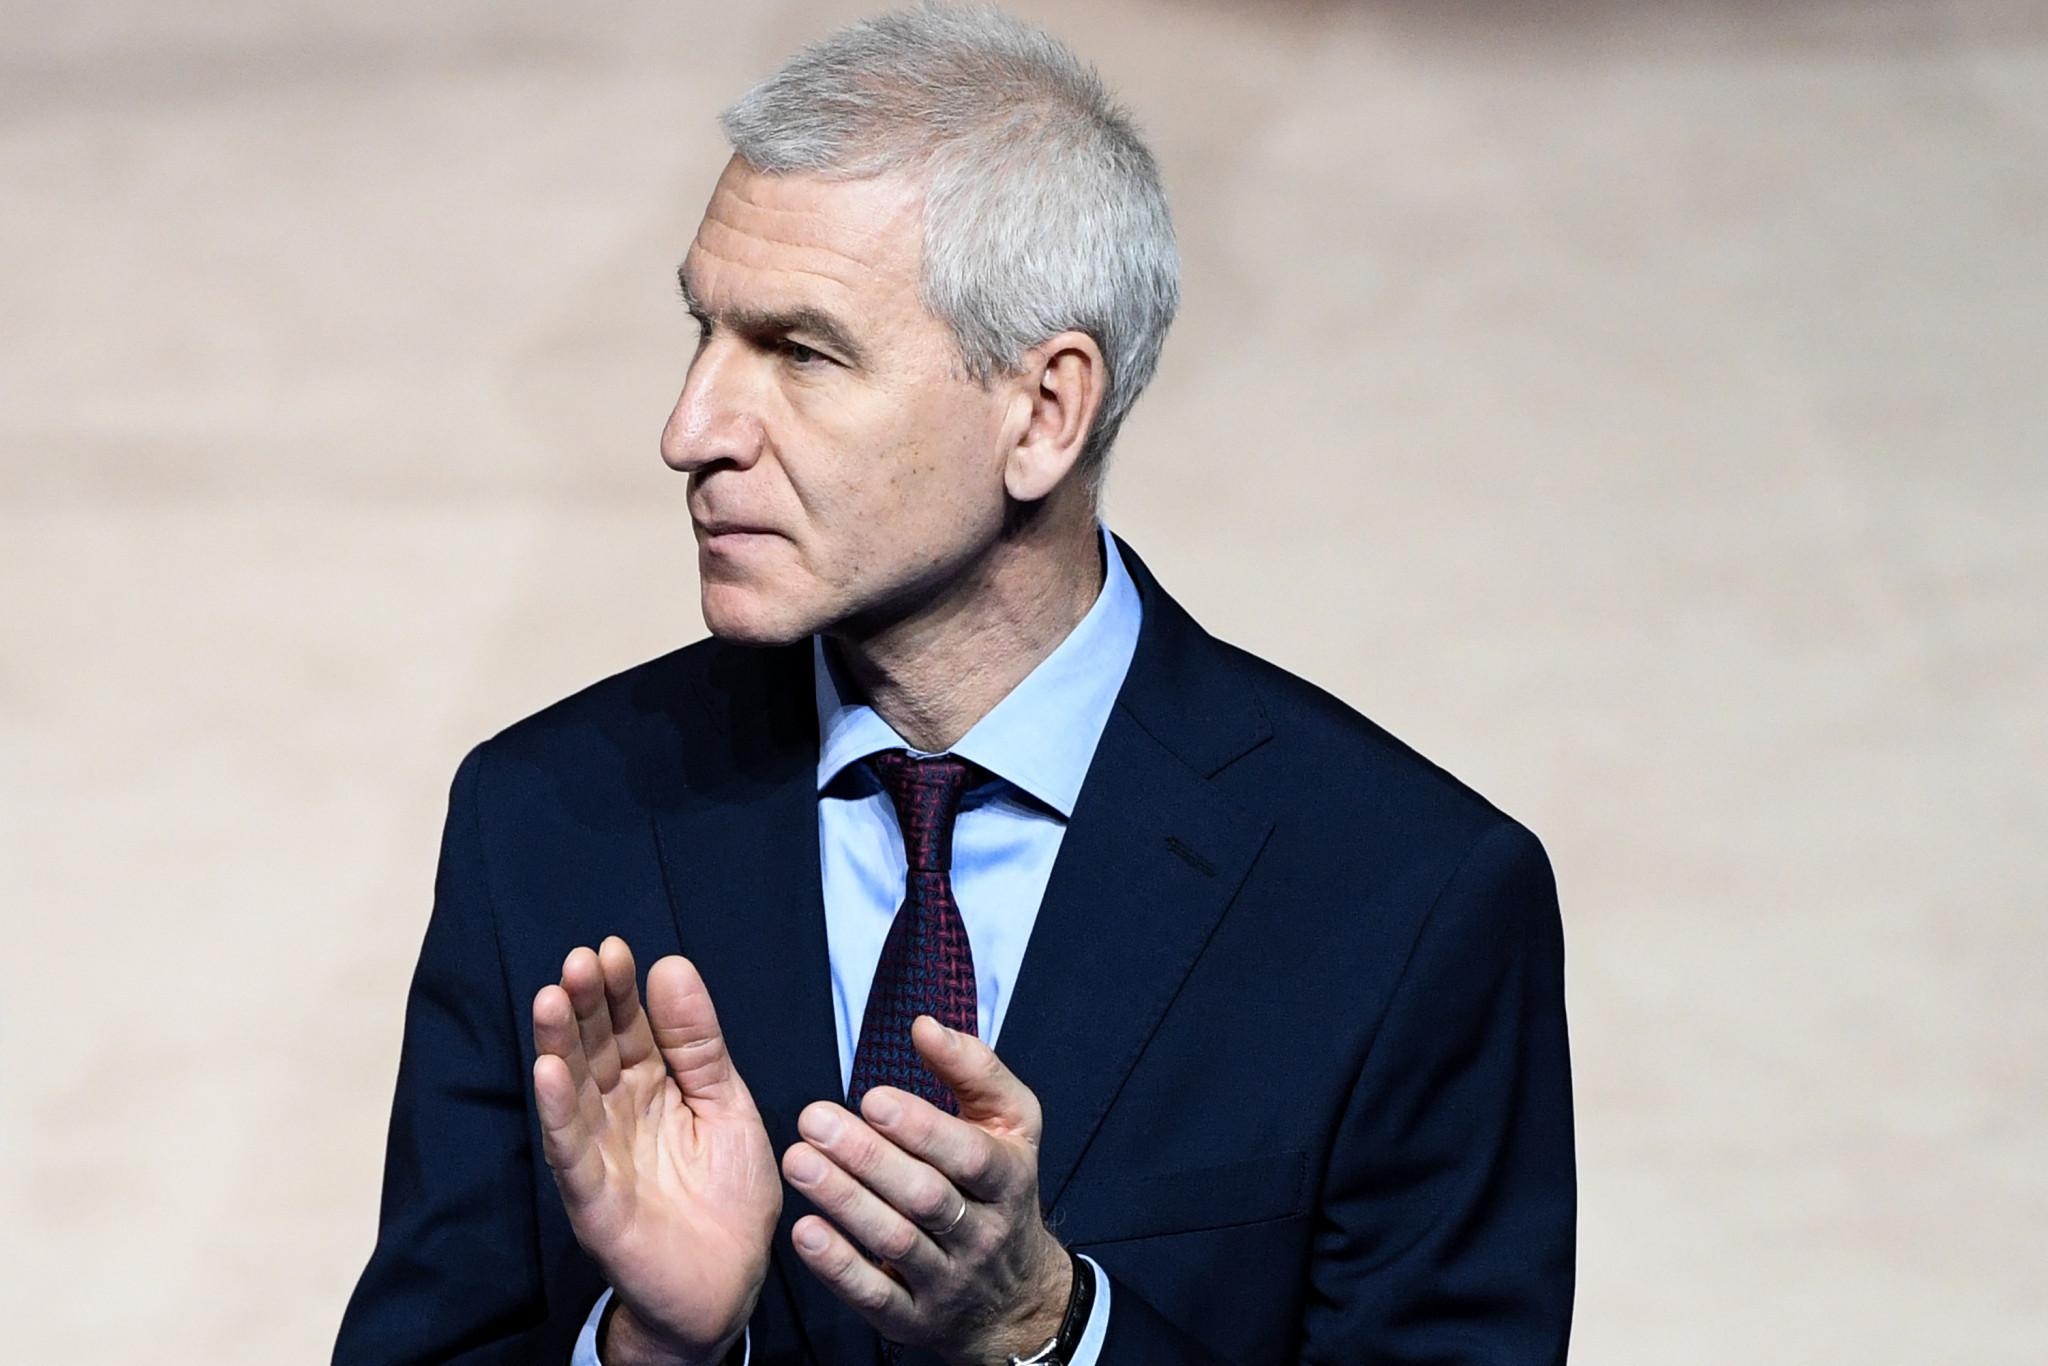 FISU President Oleg Matytsin described the death of Adrian Gagea as